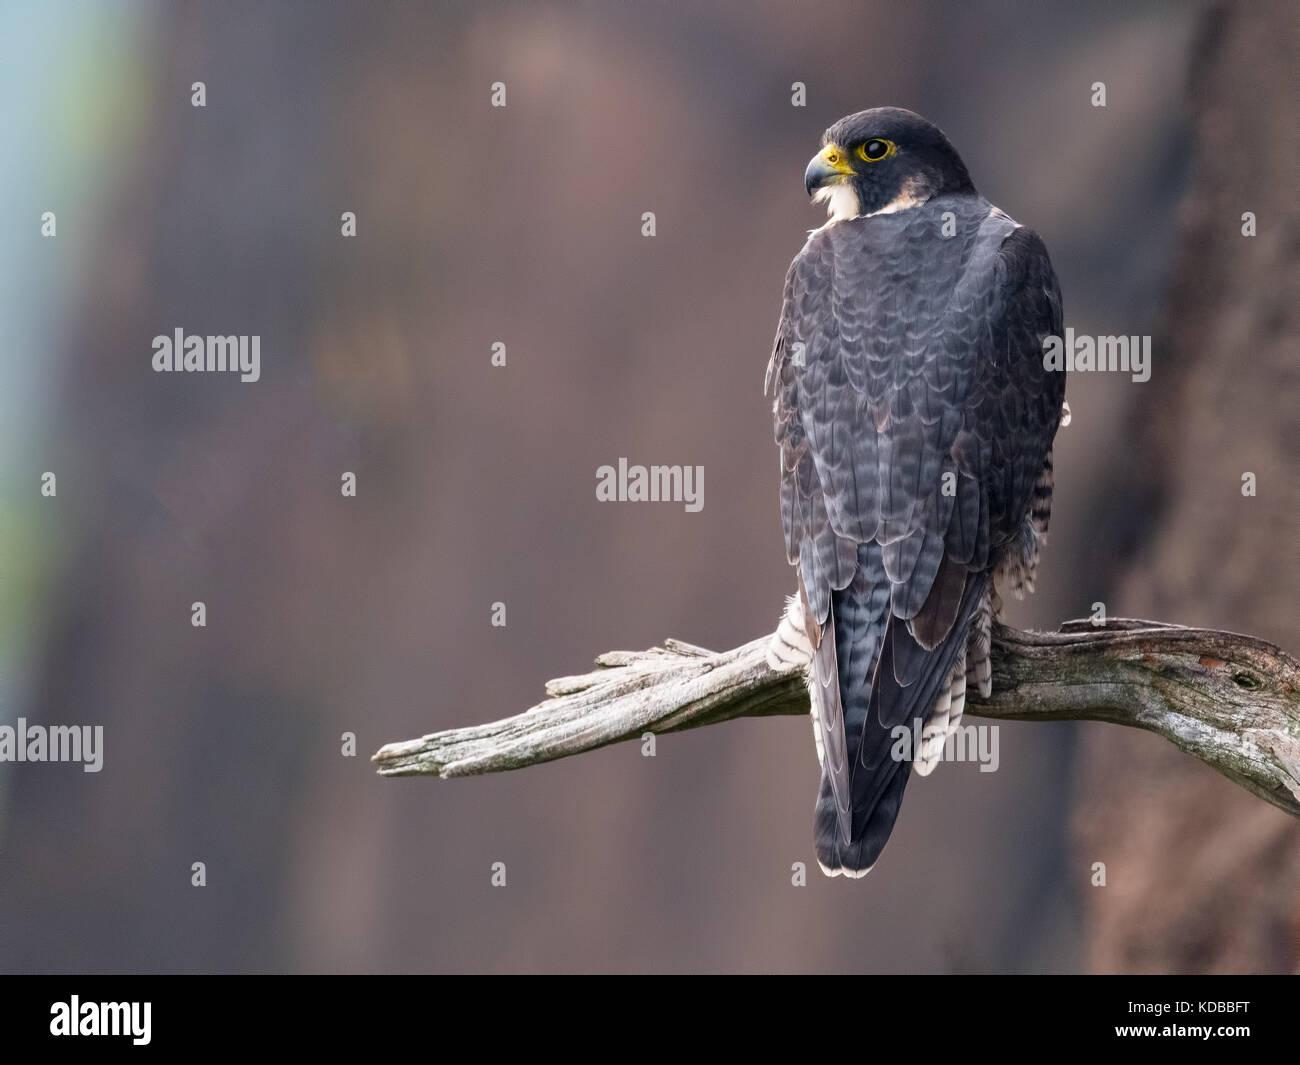 Peregrin Falcon - Stock Image